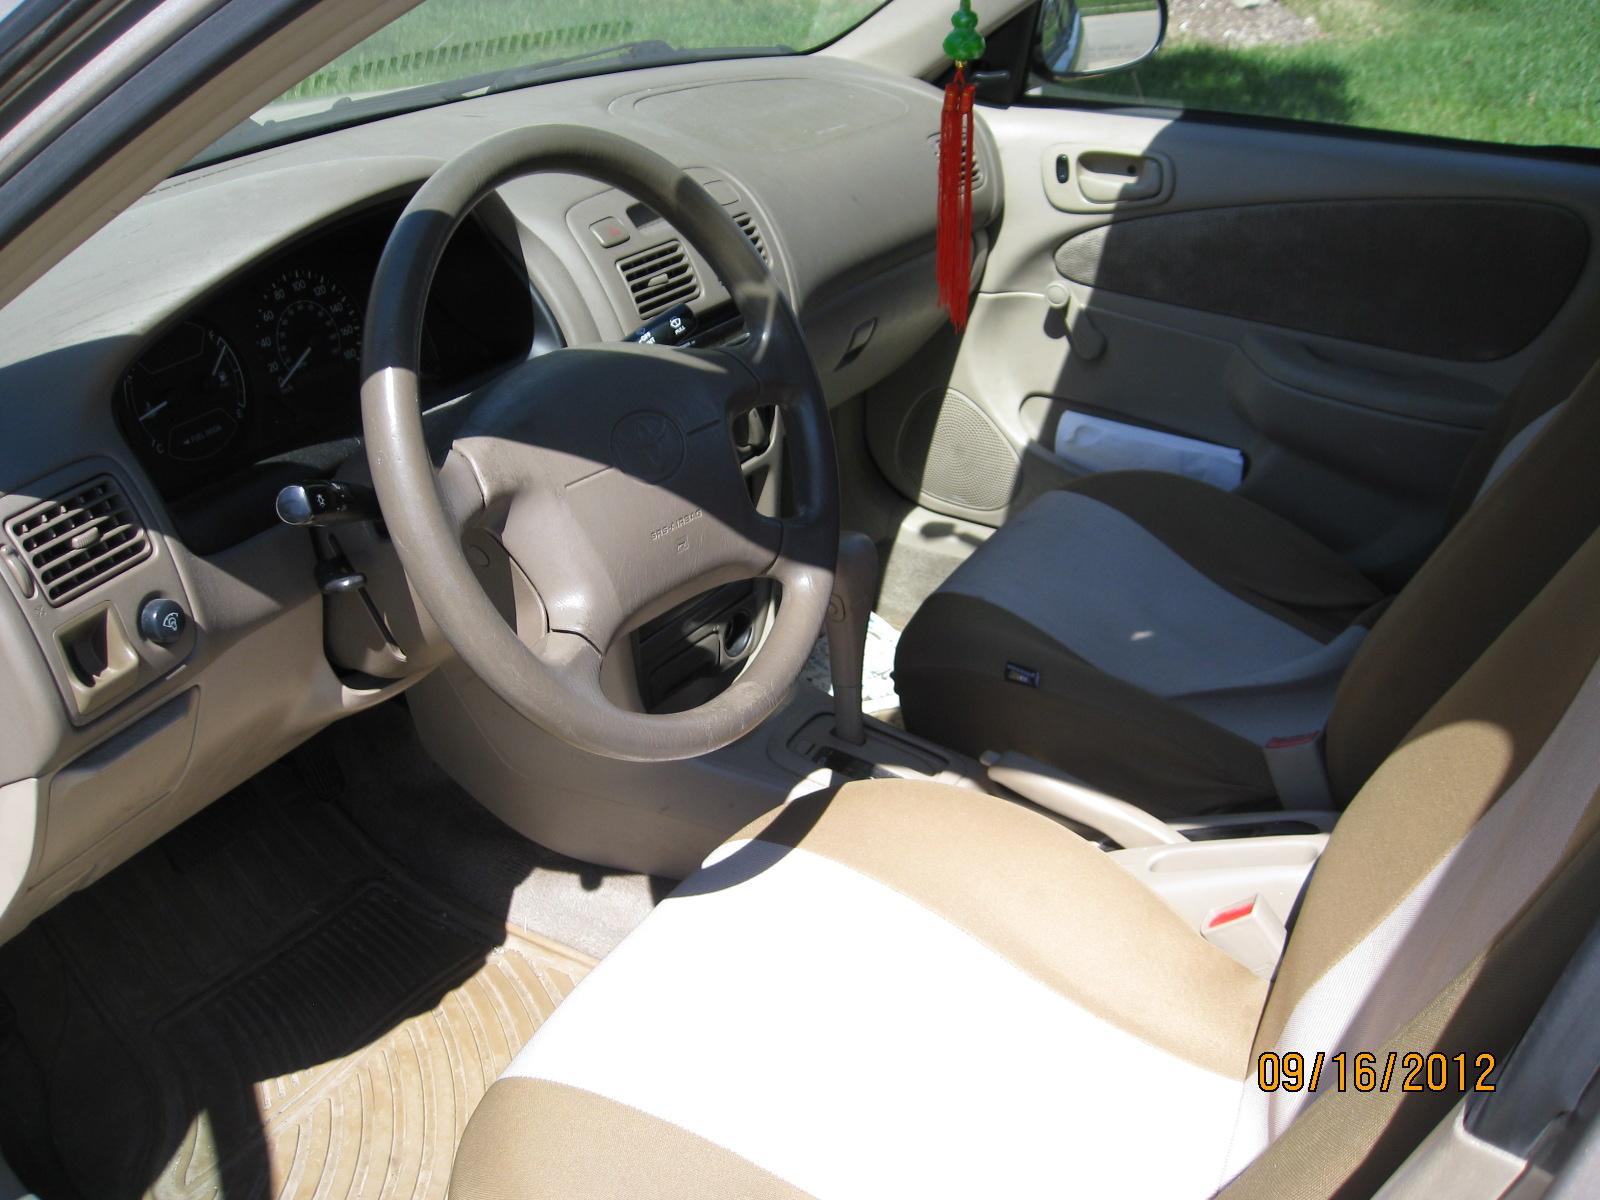 Toyota Corolla Interior 2002 2002 Toyota Corolla Interior